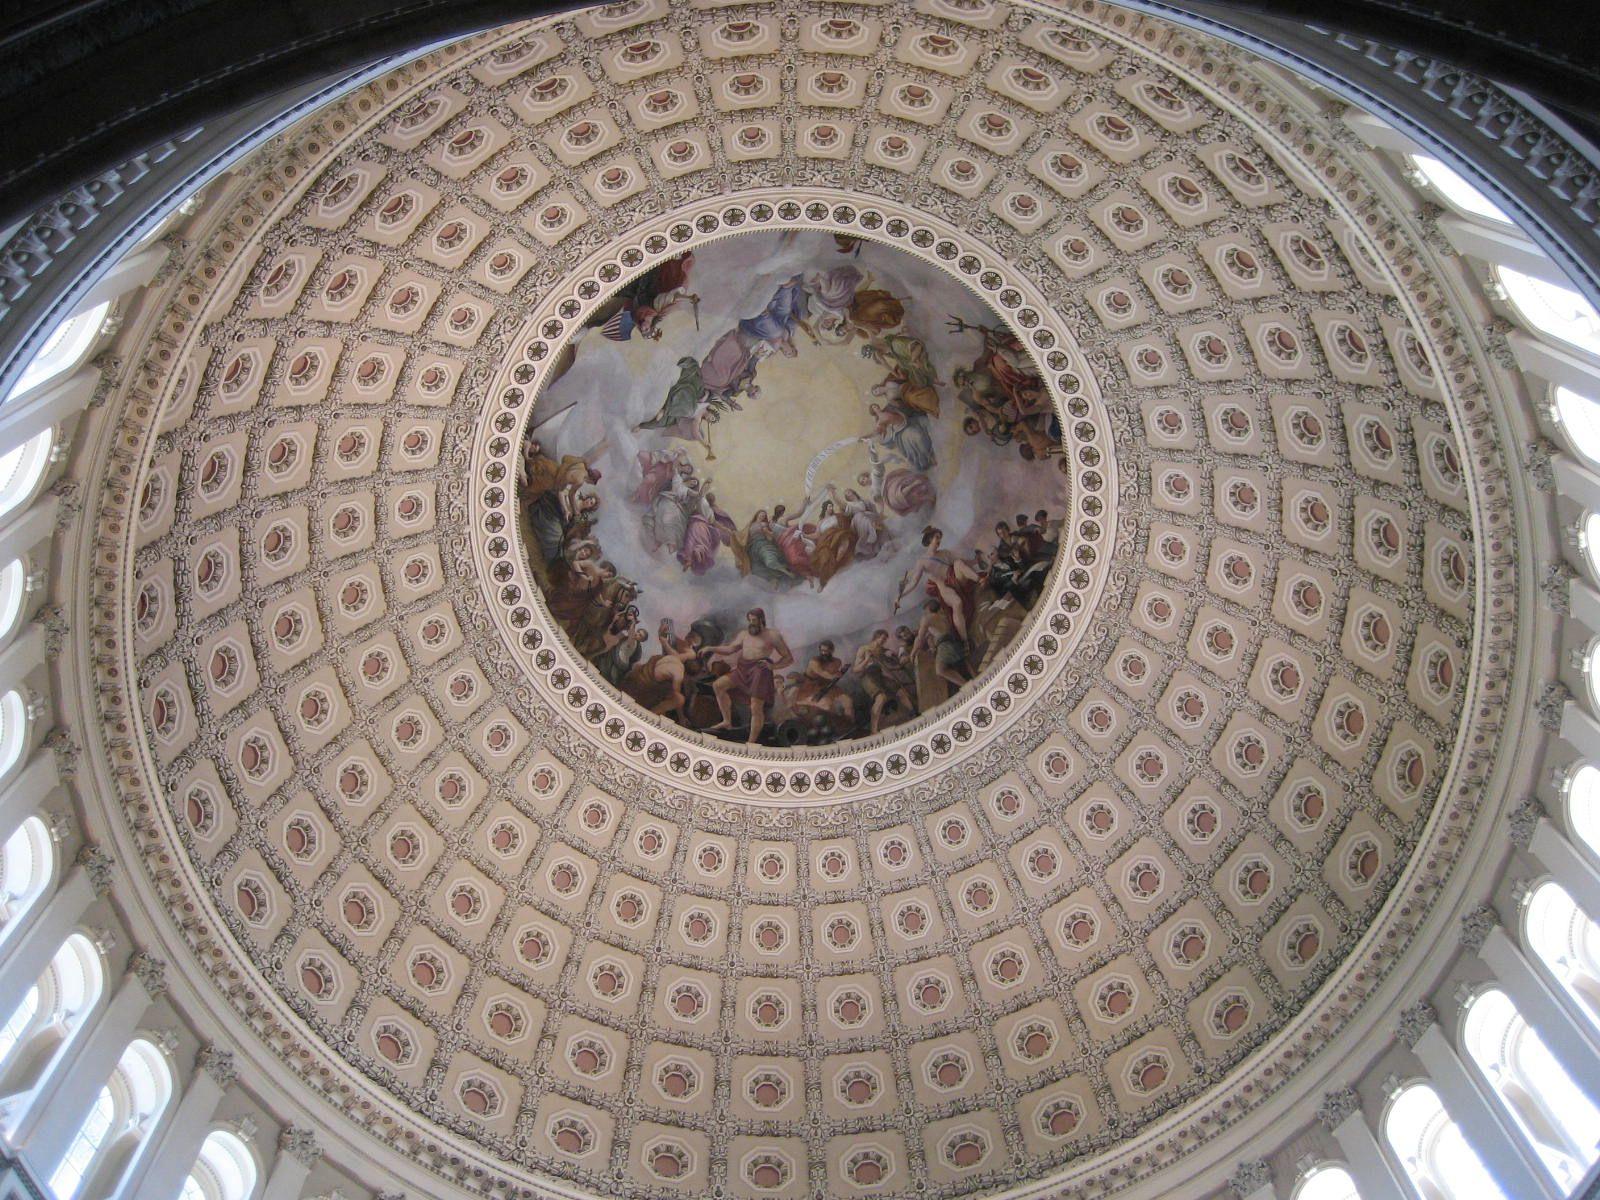 Ceiling inside US Capital